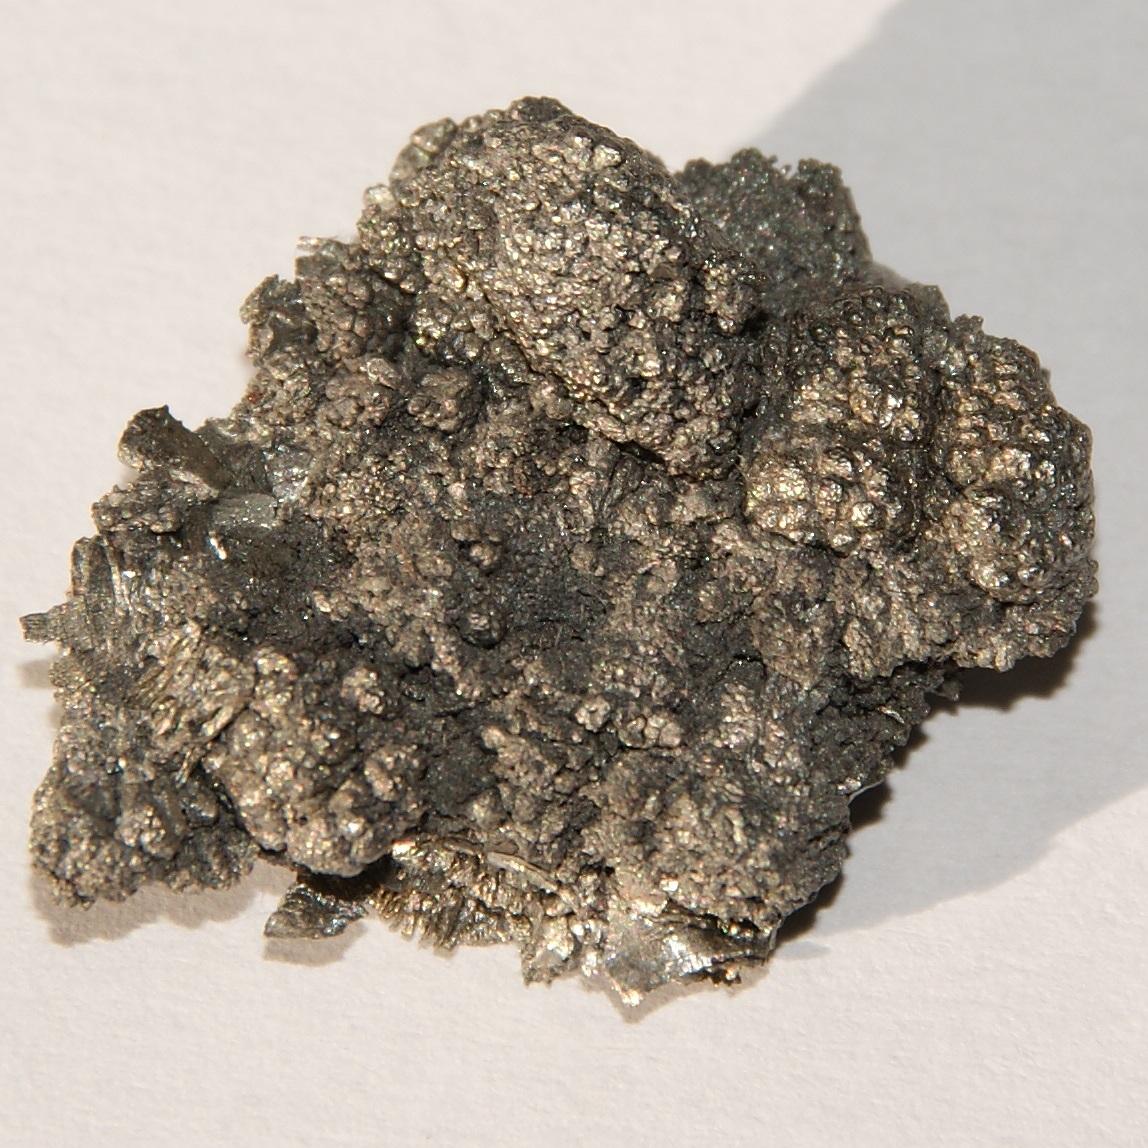 File:Hafnium (Hf).jpg - Wikimedia Commons